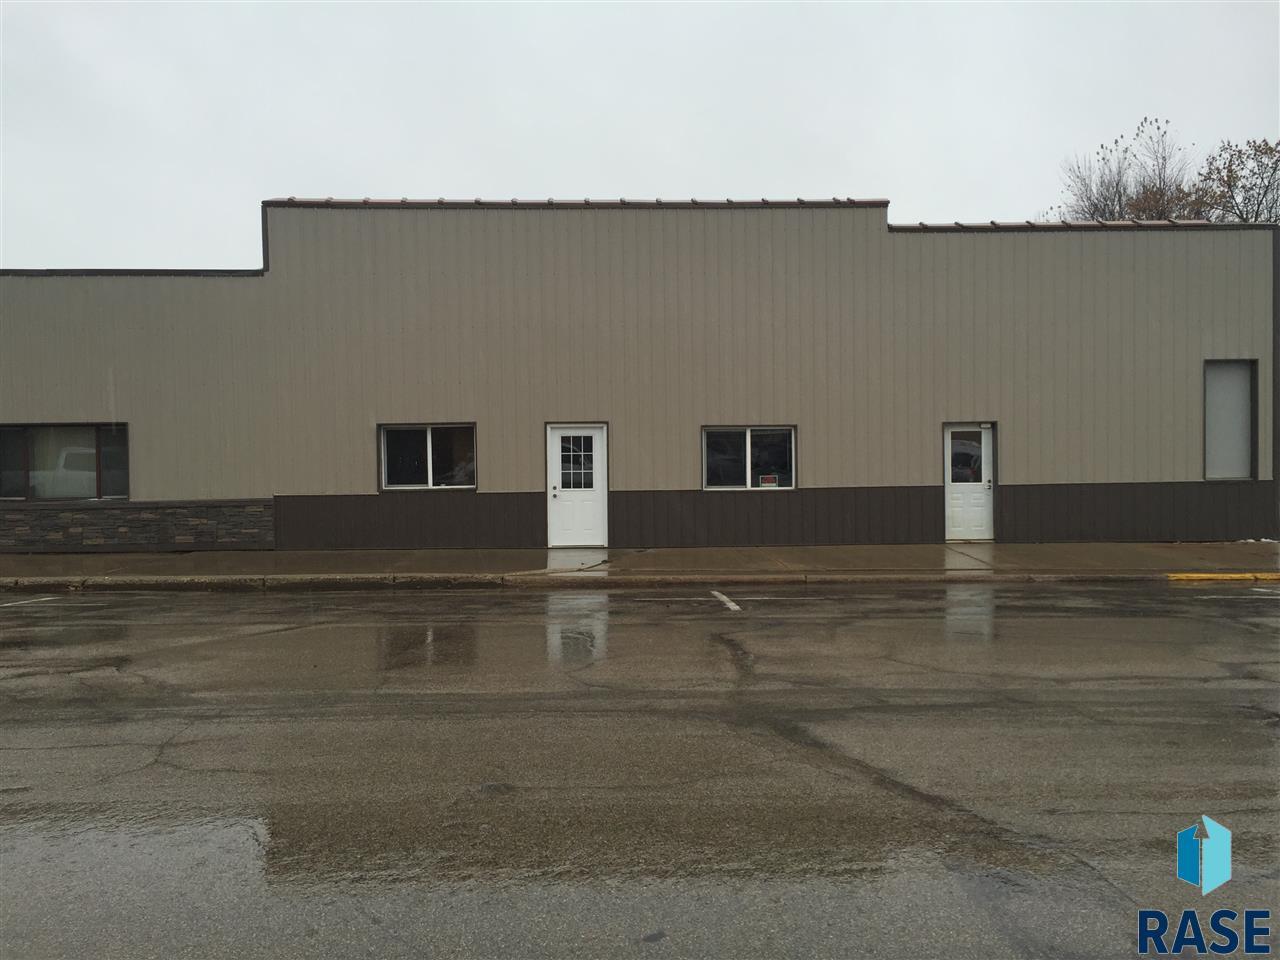 101 S McKenzie St, Luverne, MN 56156